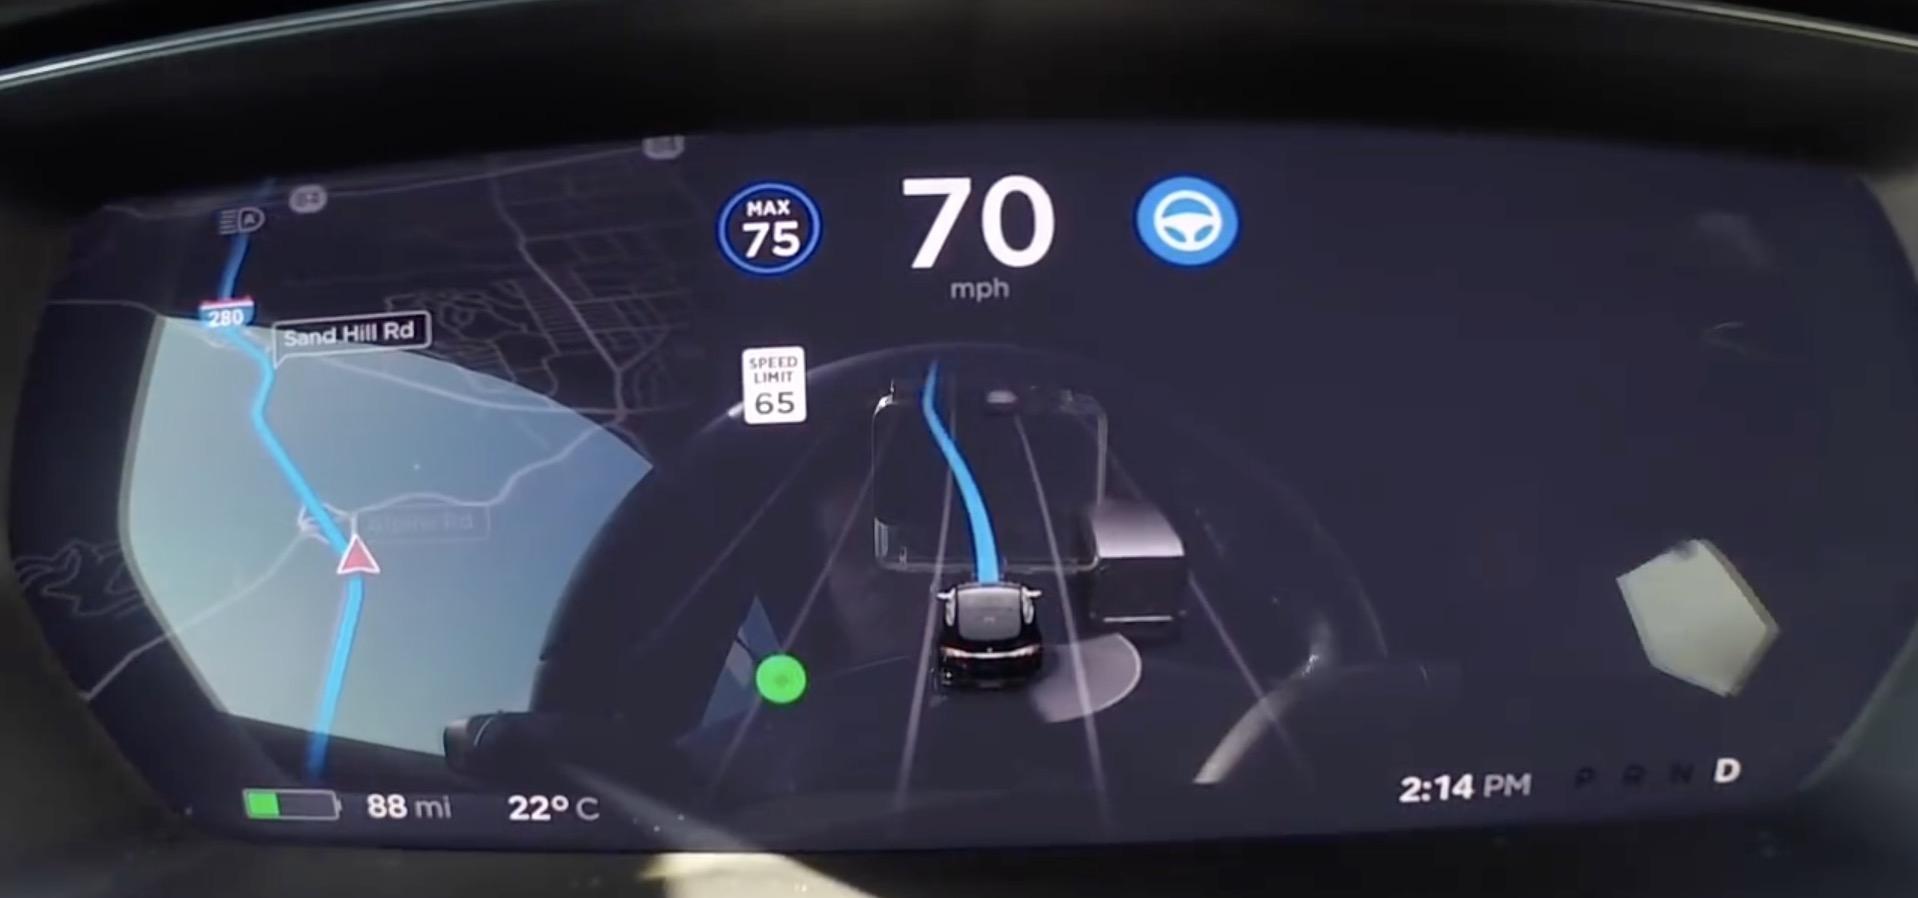 Tesla Update >> Tesla Starts Releasing Navigate On Autopilot Feature With